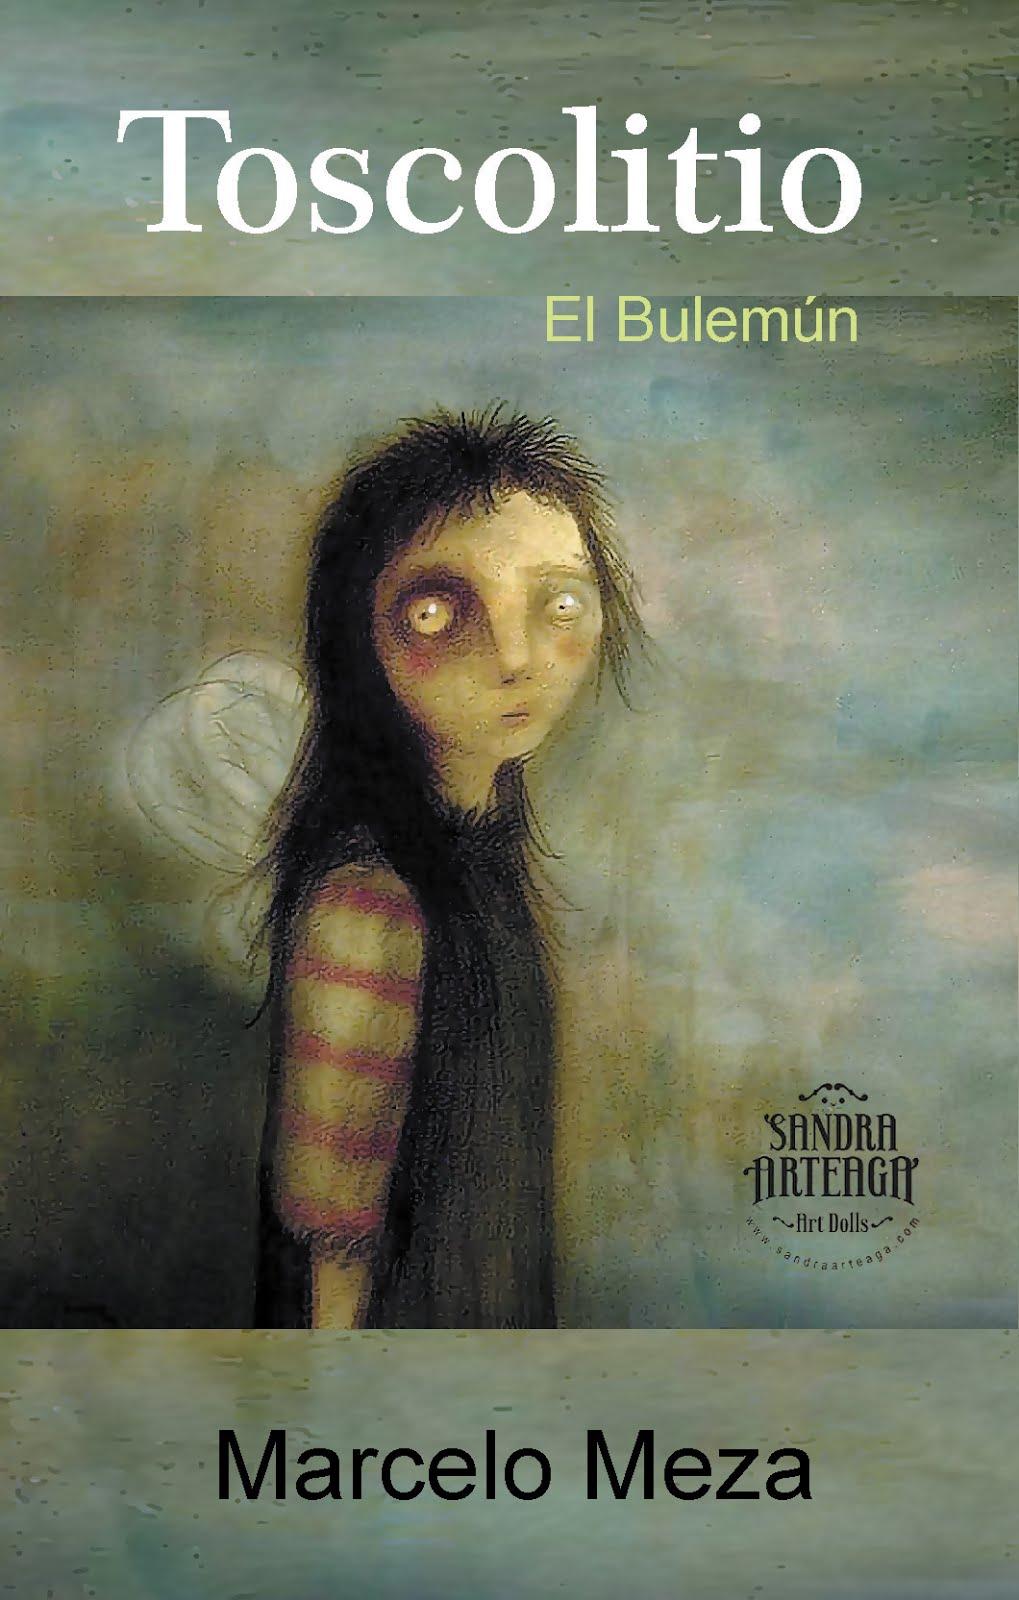 Toscolito, El Bulemún